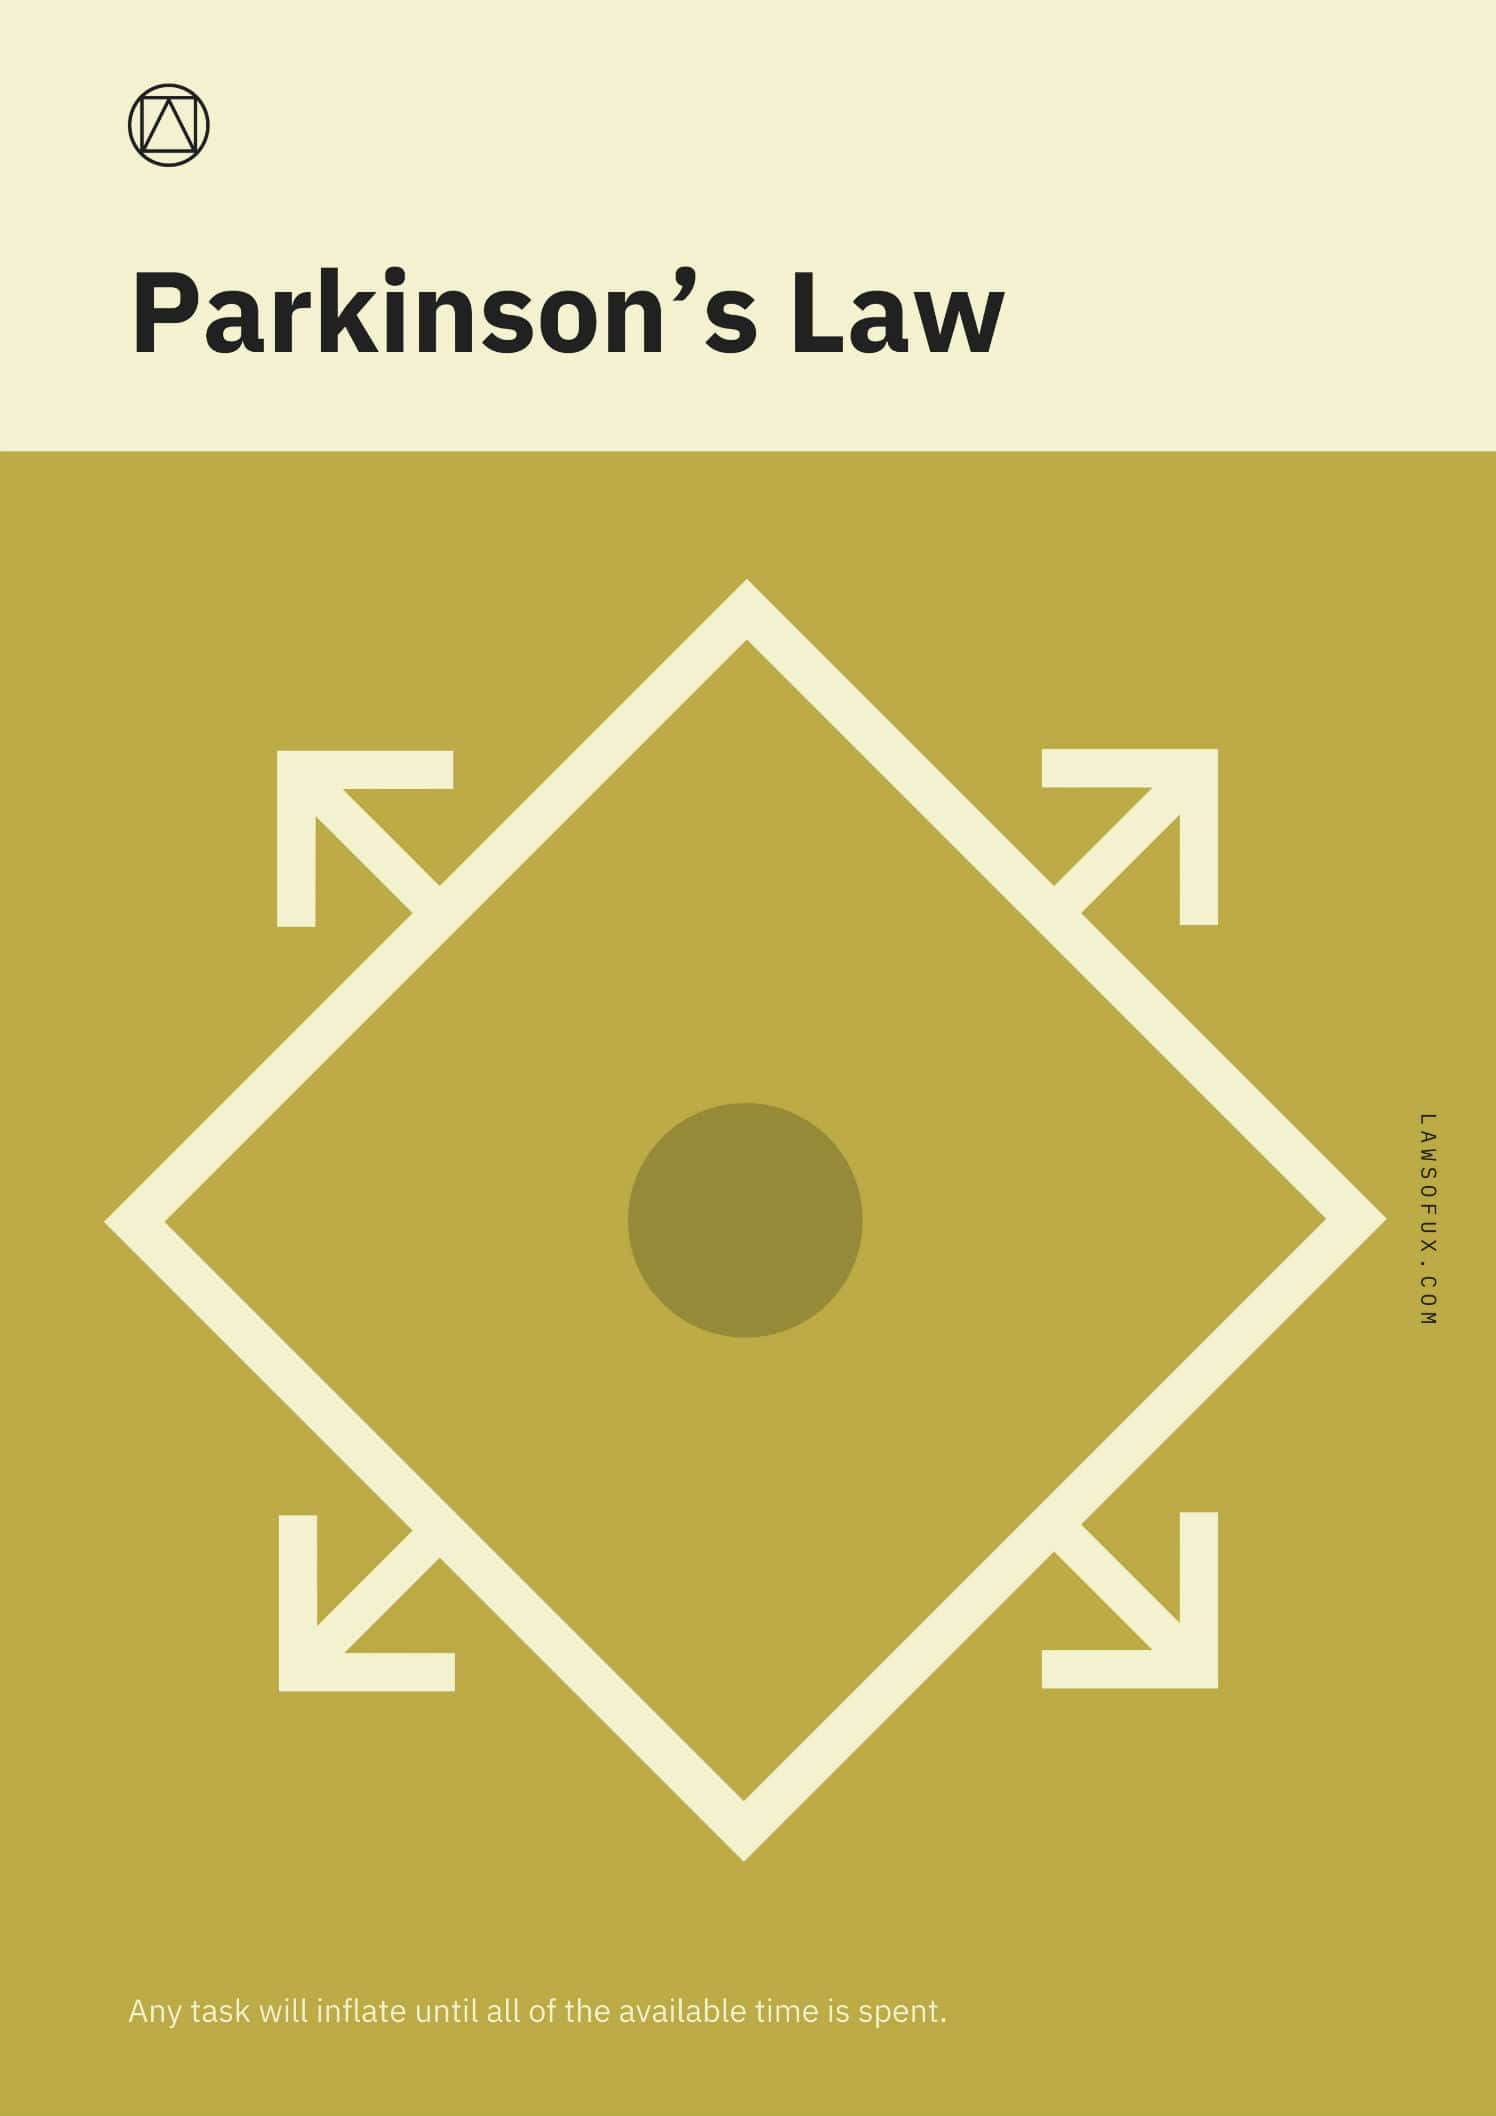 Закон Паркинсона